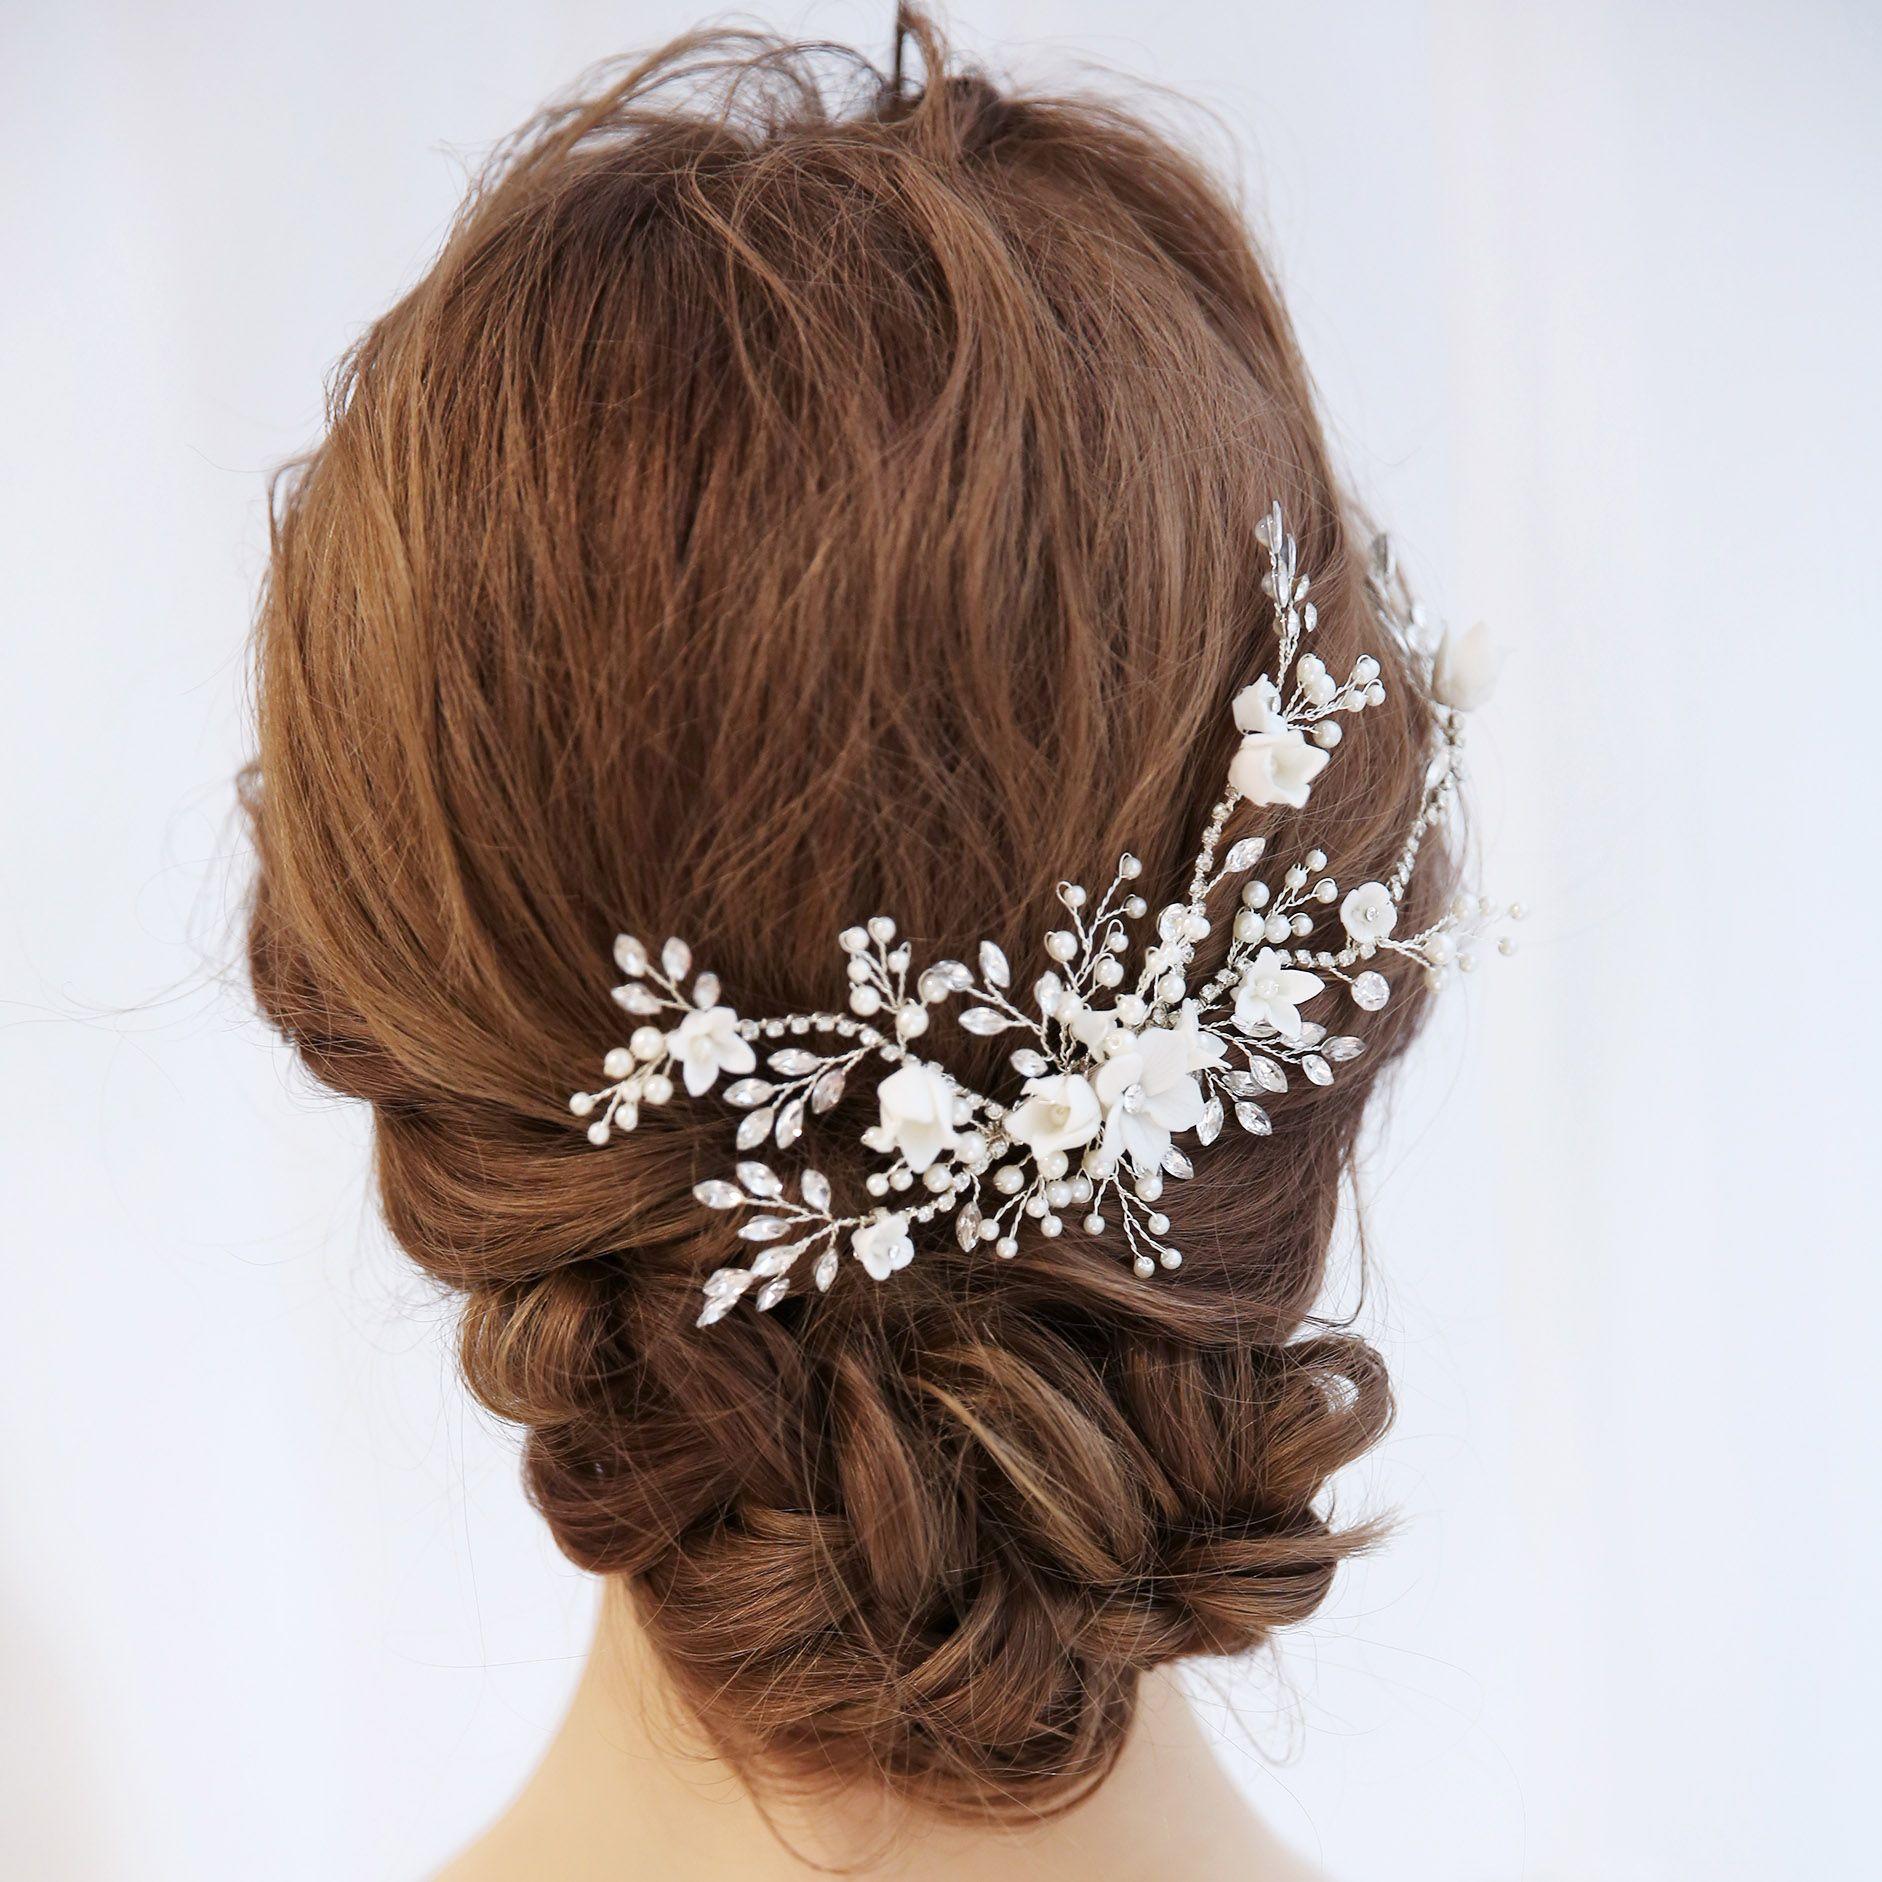 Romantic Floral Bridal Hair b Antique Crystal Wedding Headpiece